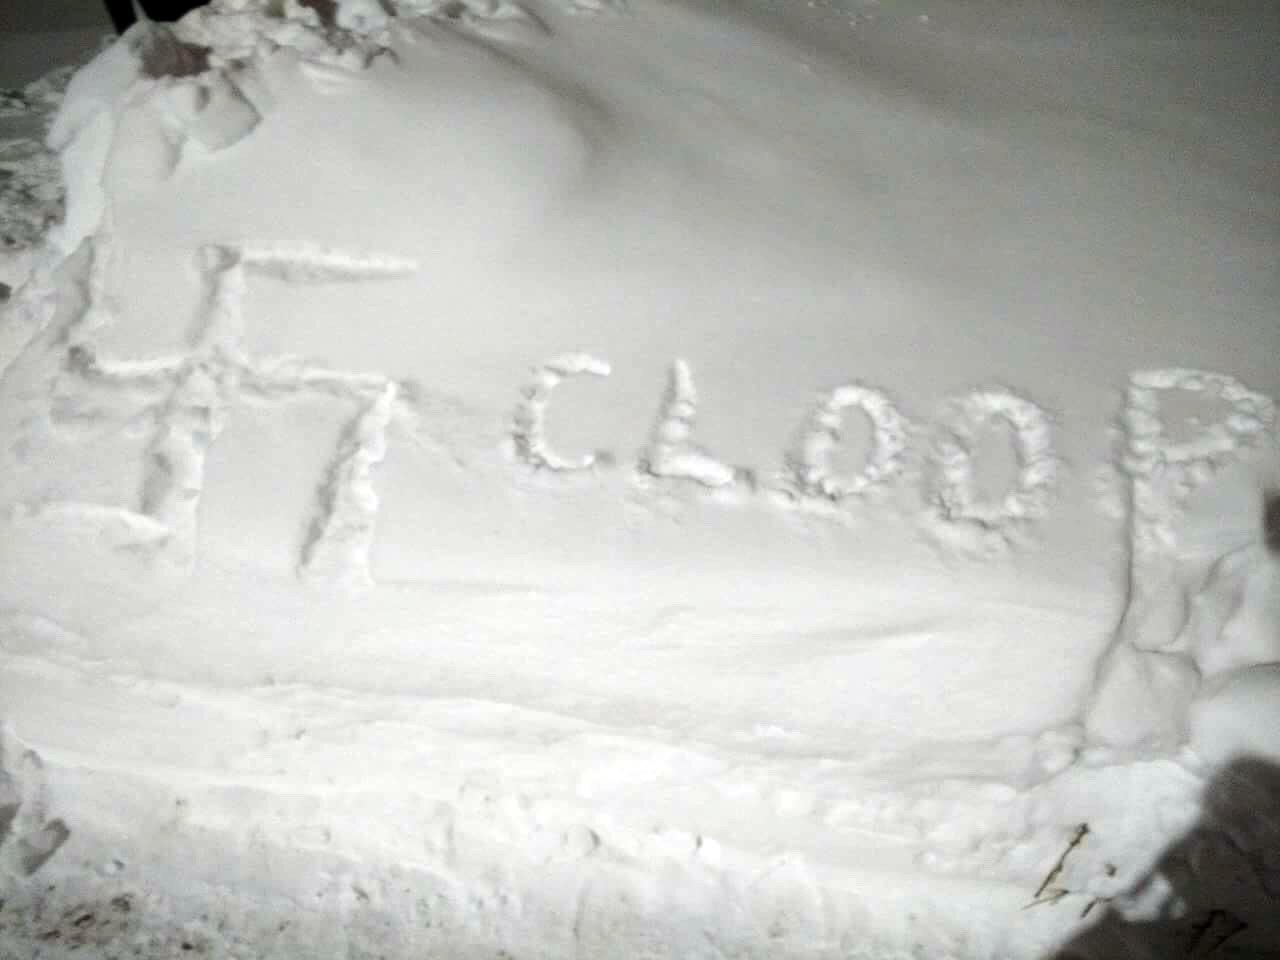 swastika_in_the_snow.JPG